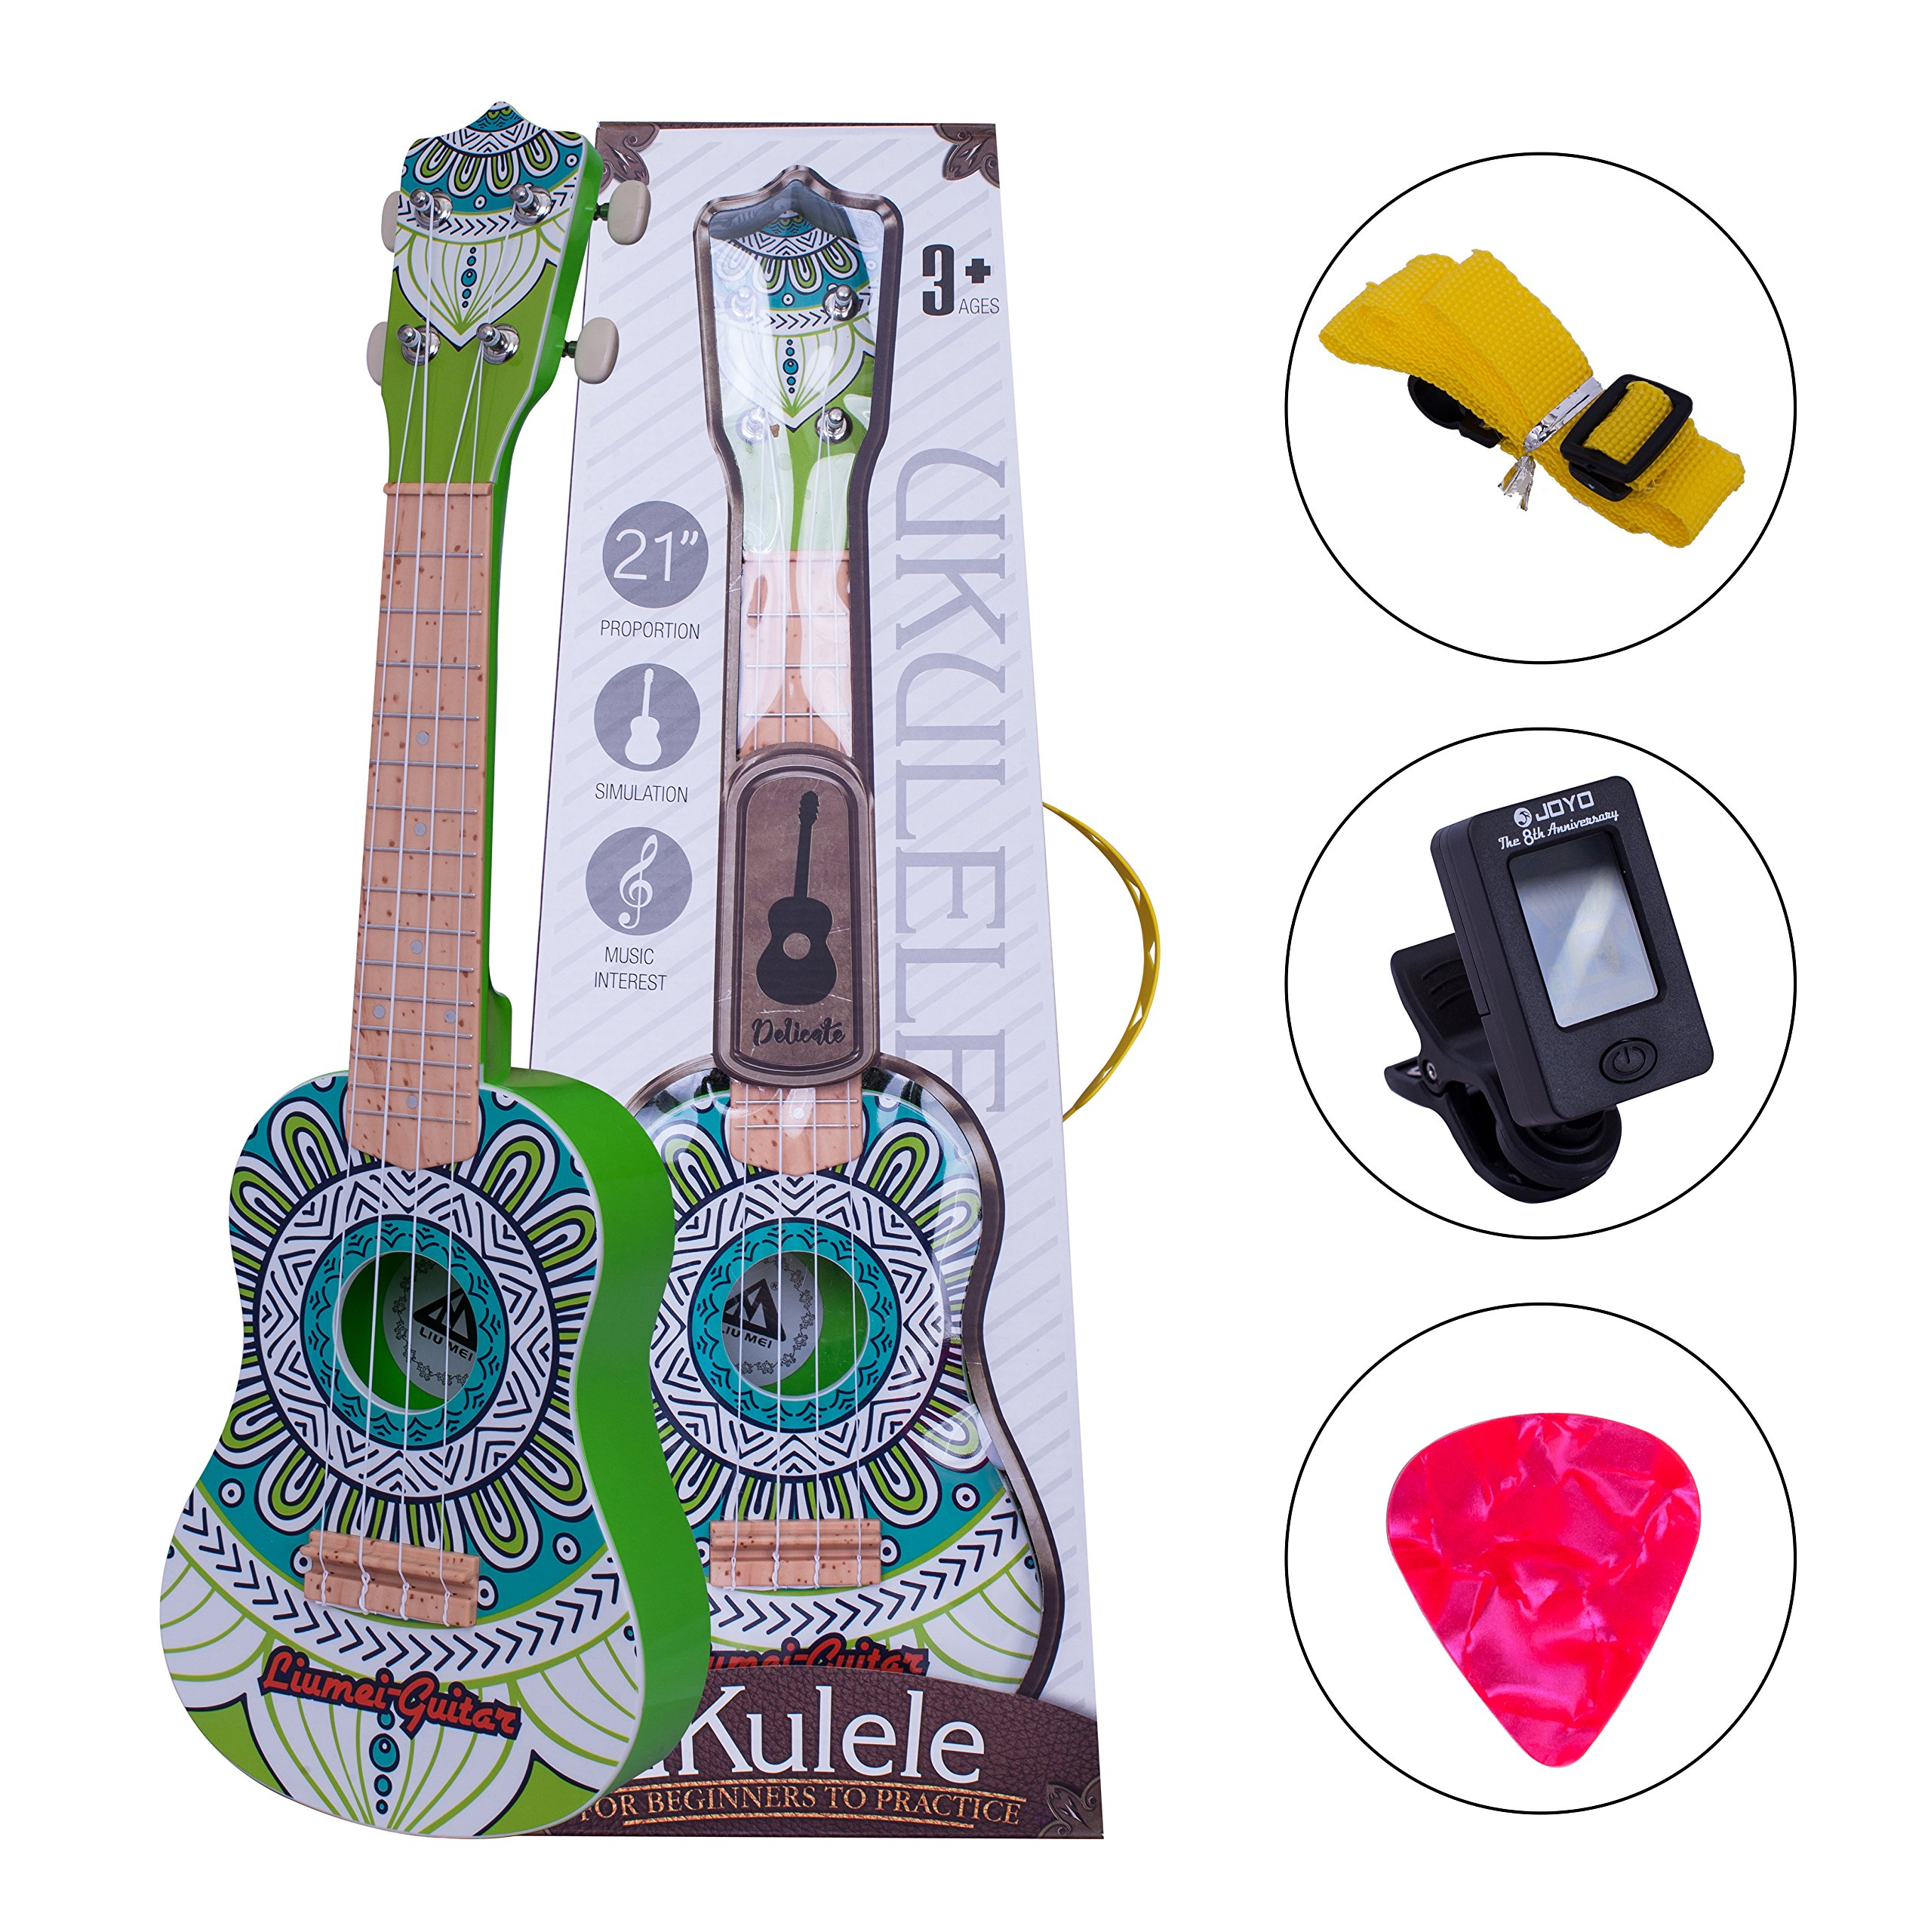 honsing Soprano Ukulele Ukulele Starter kit Green Ukulele for Beginner with Tuner Pick Strap Kids Guitar by honsing (Image #1)